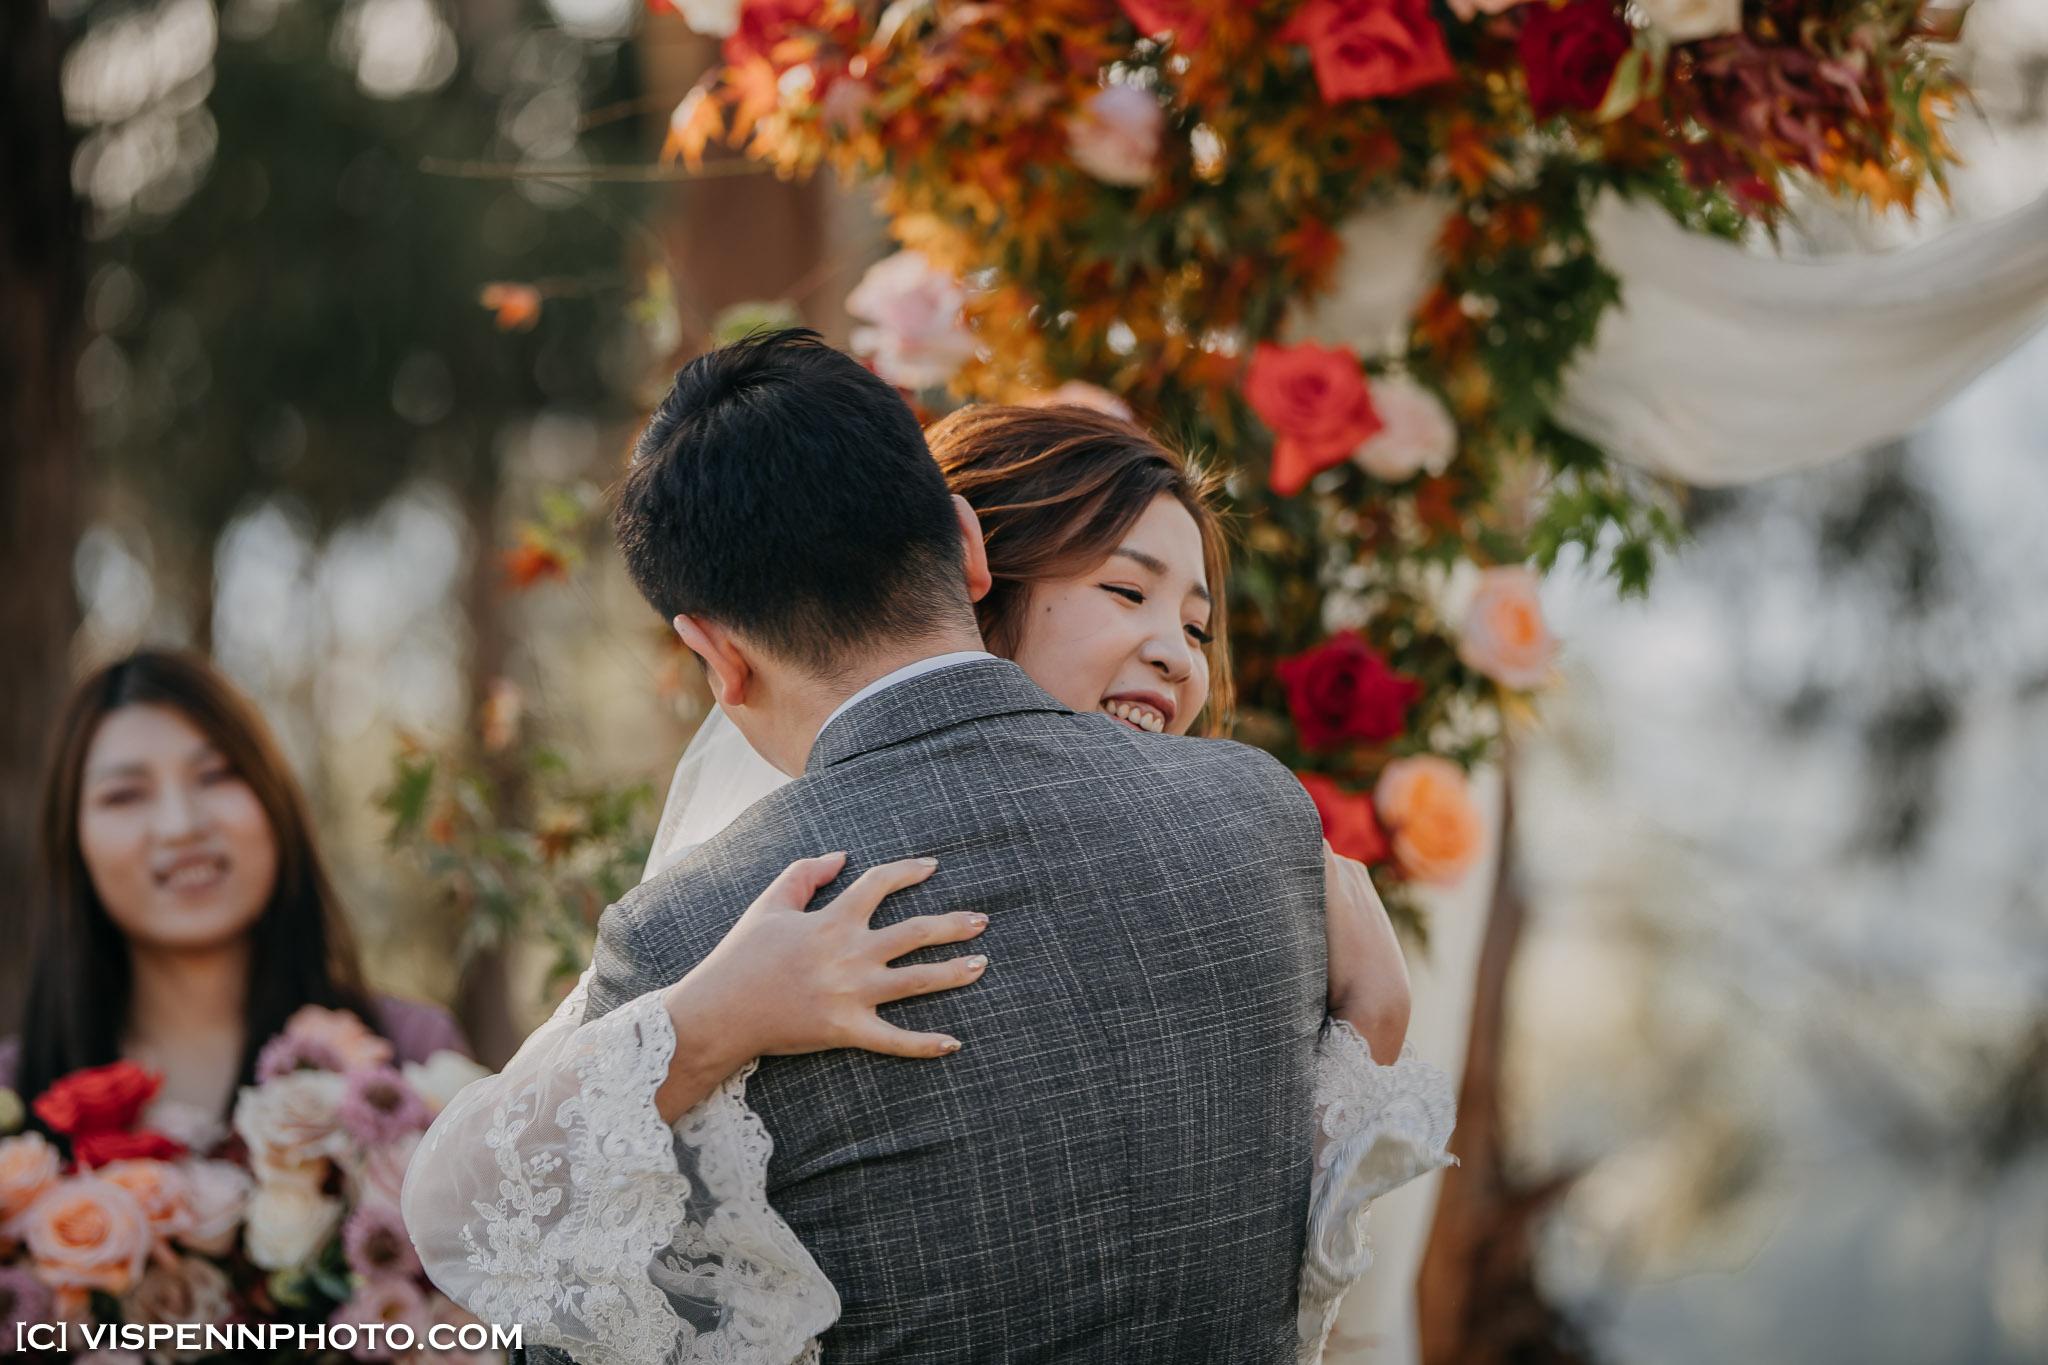 WEDDING DAY Photography Melbourne DominicHelen 2P 5763 1DX2 ZHPENN